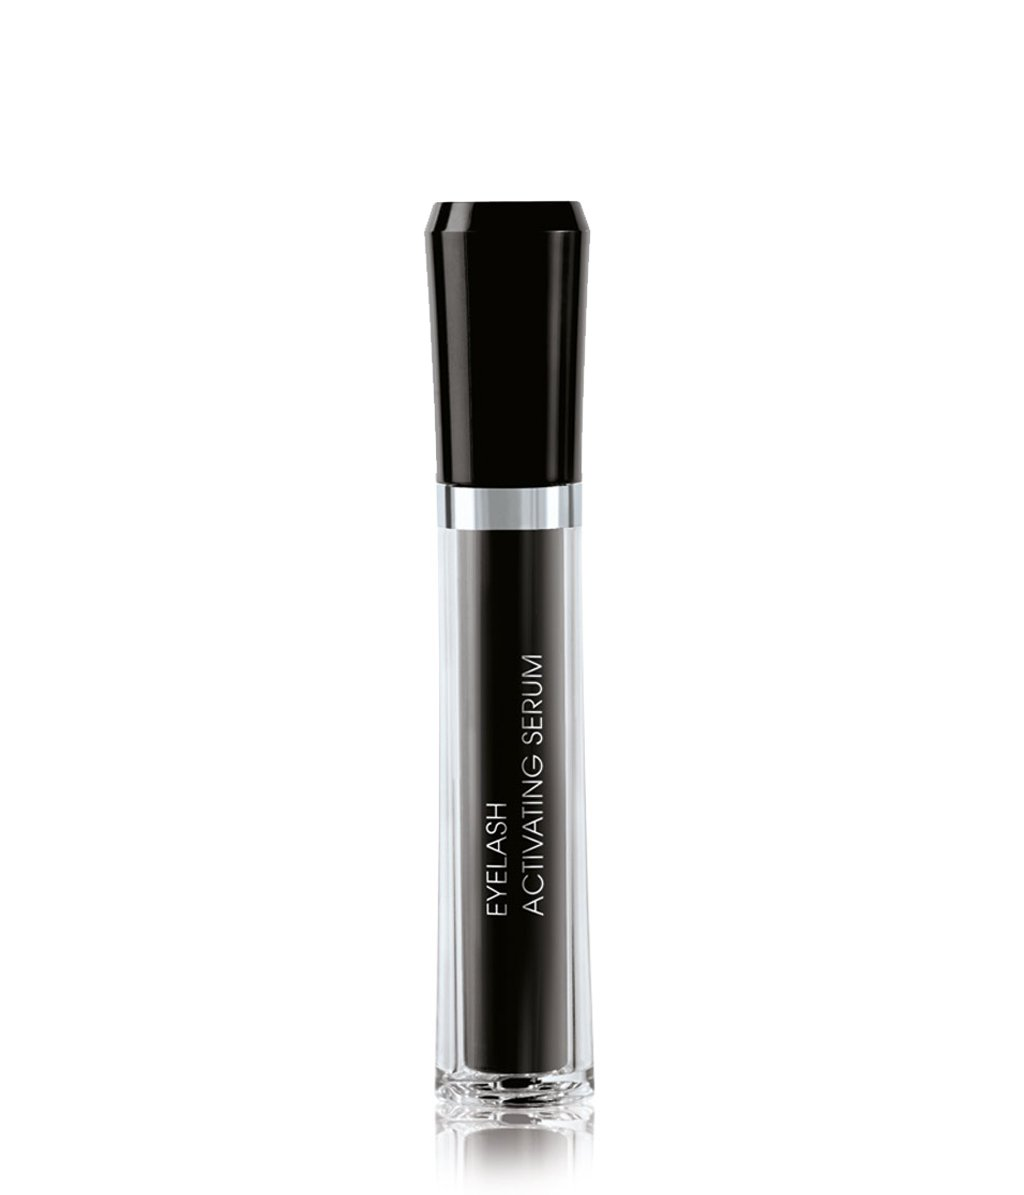 m2 beaut eyelash activating serum online bestellen flaconi. Black Bedroom Furniture Sets. Home Design Ideas